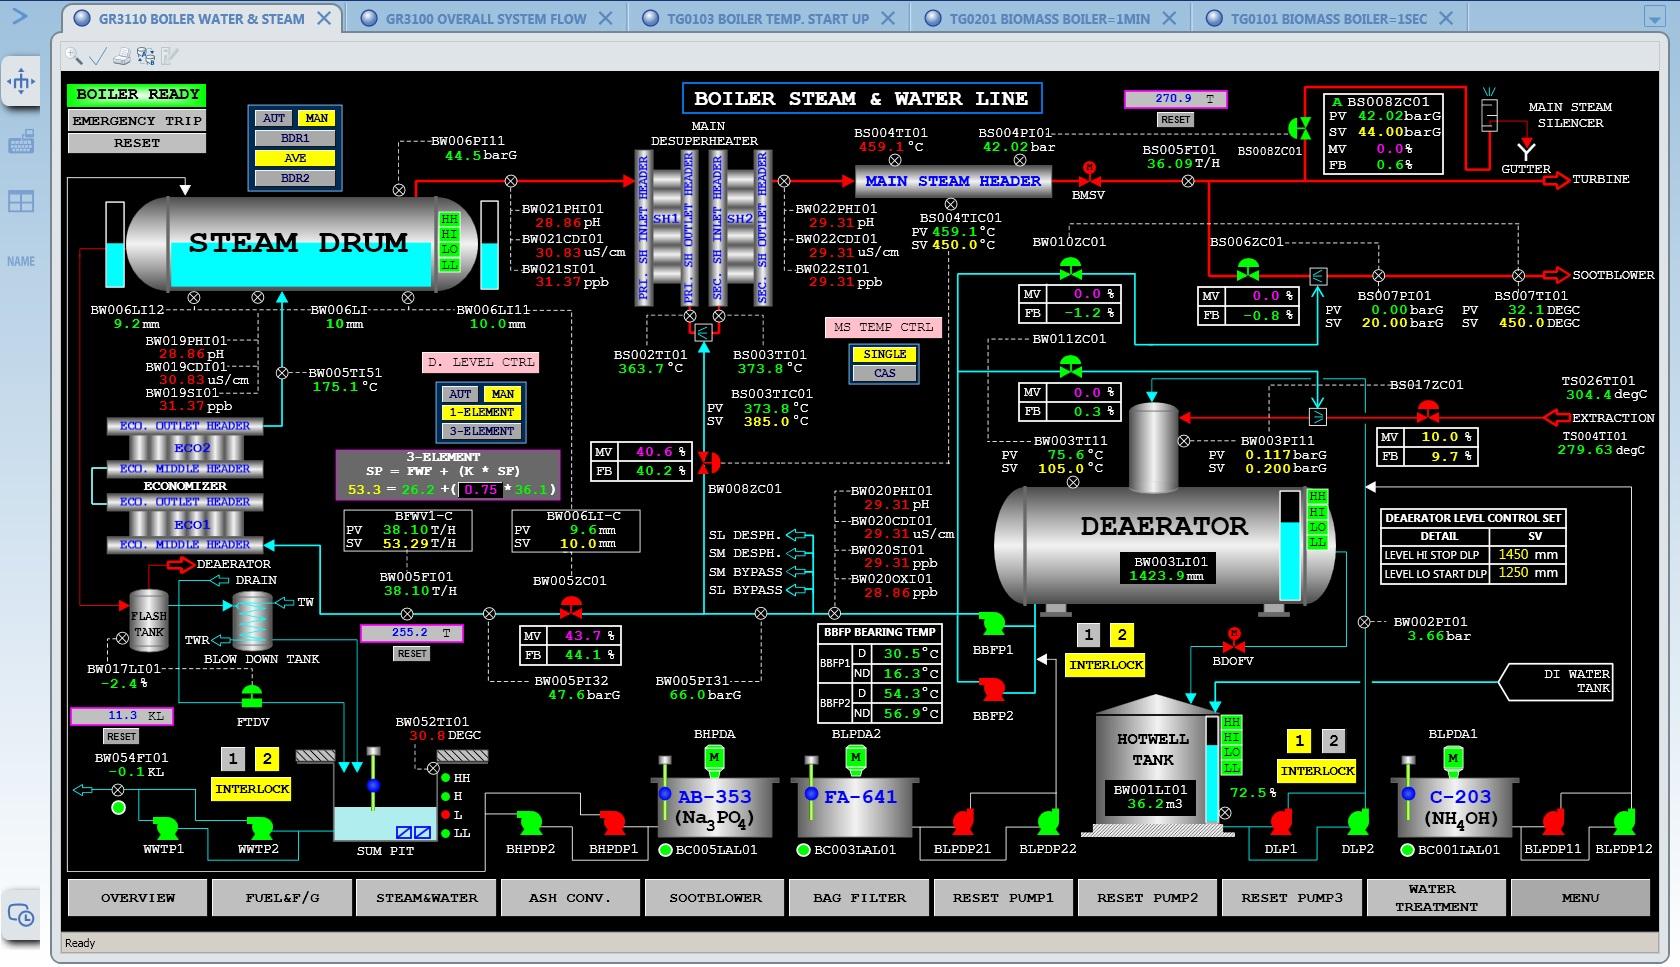 020316 100% load - 1 (EIC)